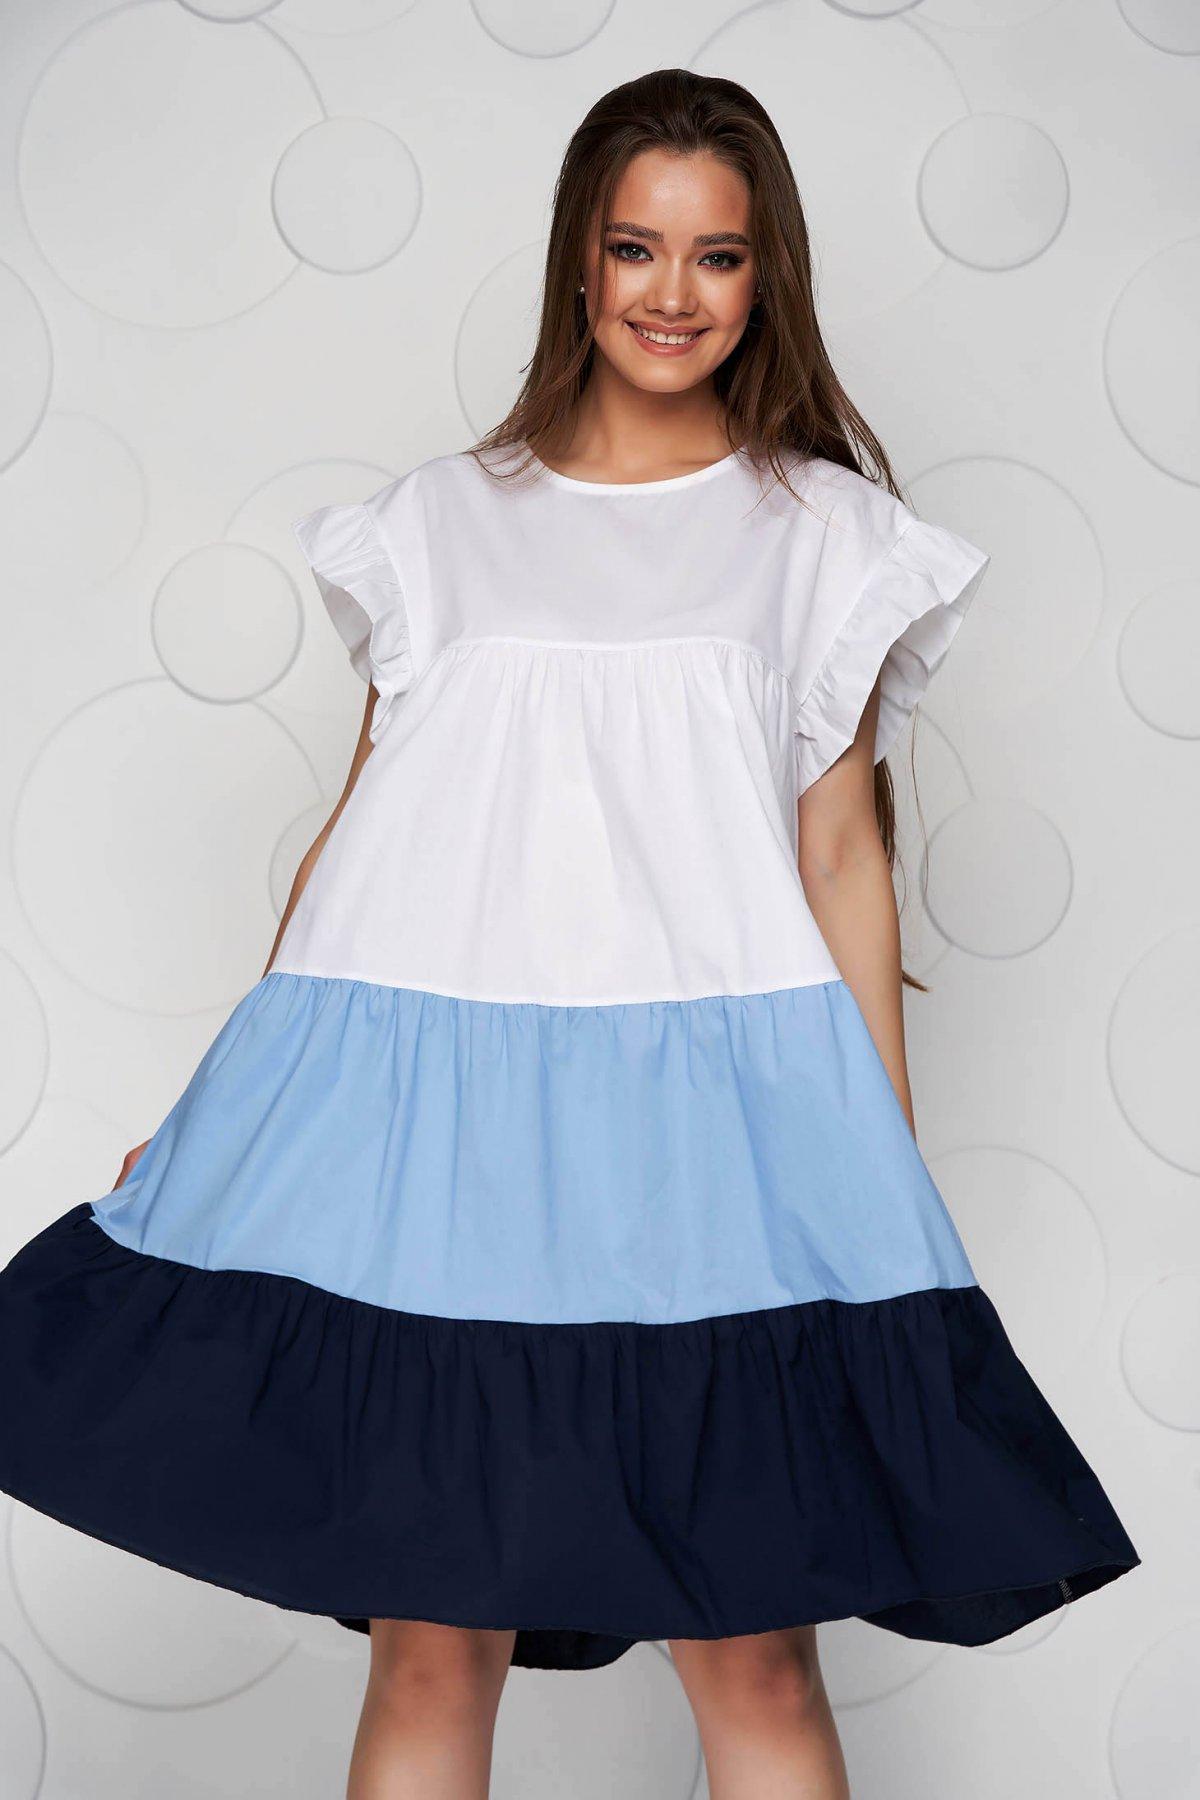 Rochie alba cu albastru-inchis din material vaporos si subtire cu croi larg midi cu volanase - medelin.ro